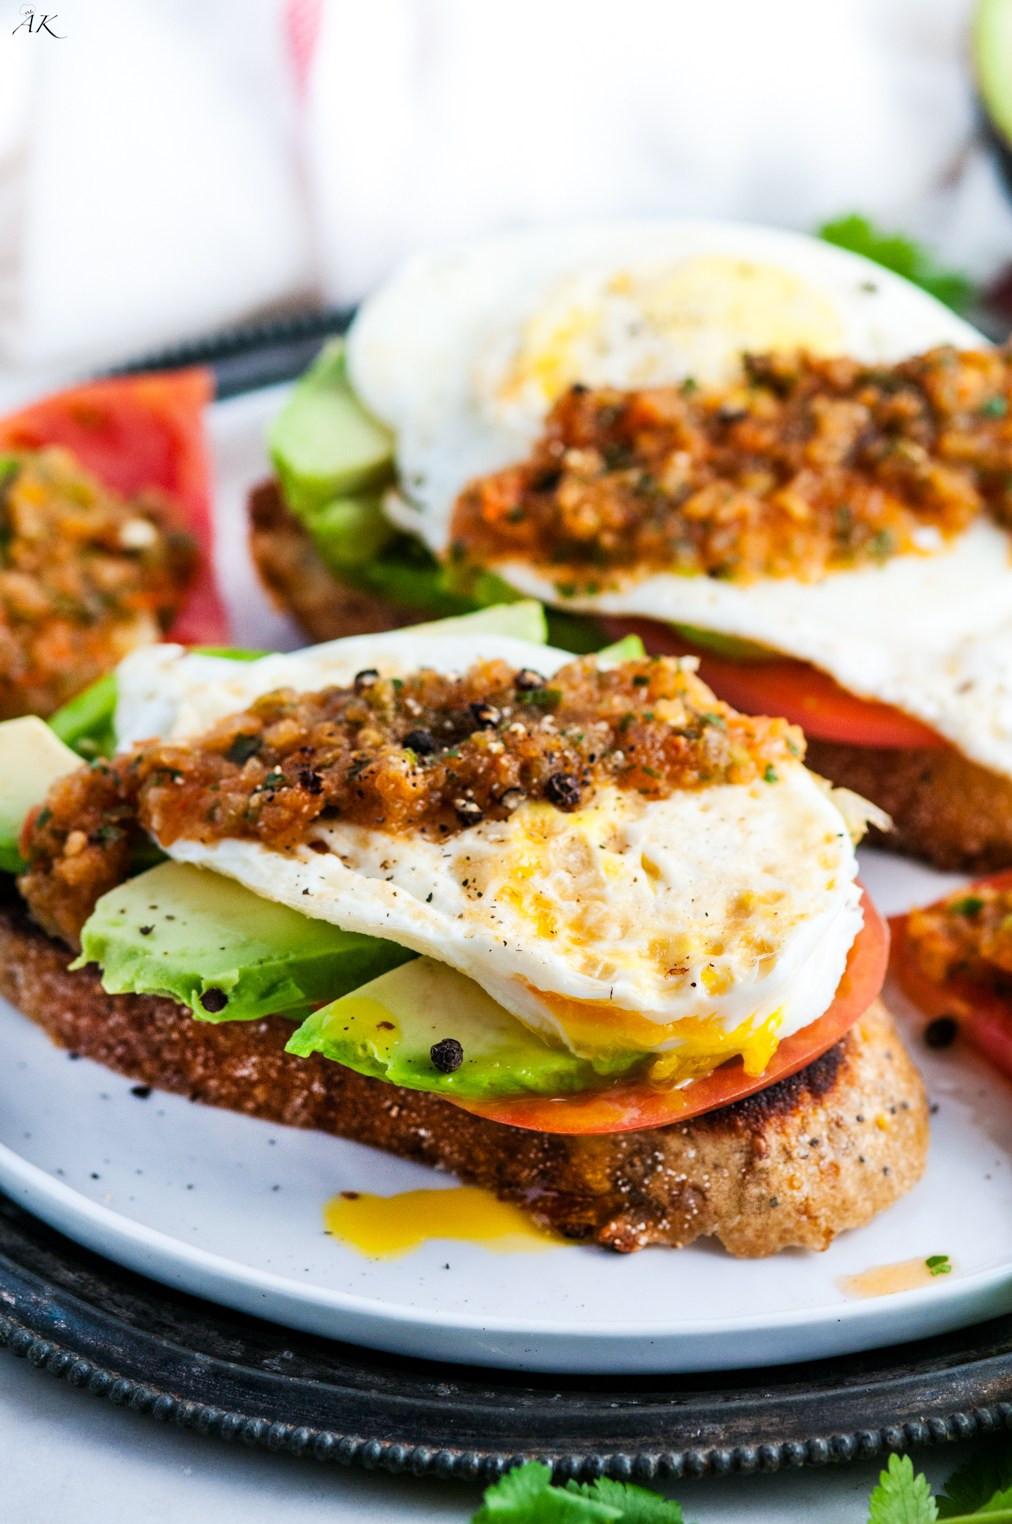 Healthy Avocado Breakfast  Healthy Tomato Avocado and Egg Breakfast Toast Aberdeen